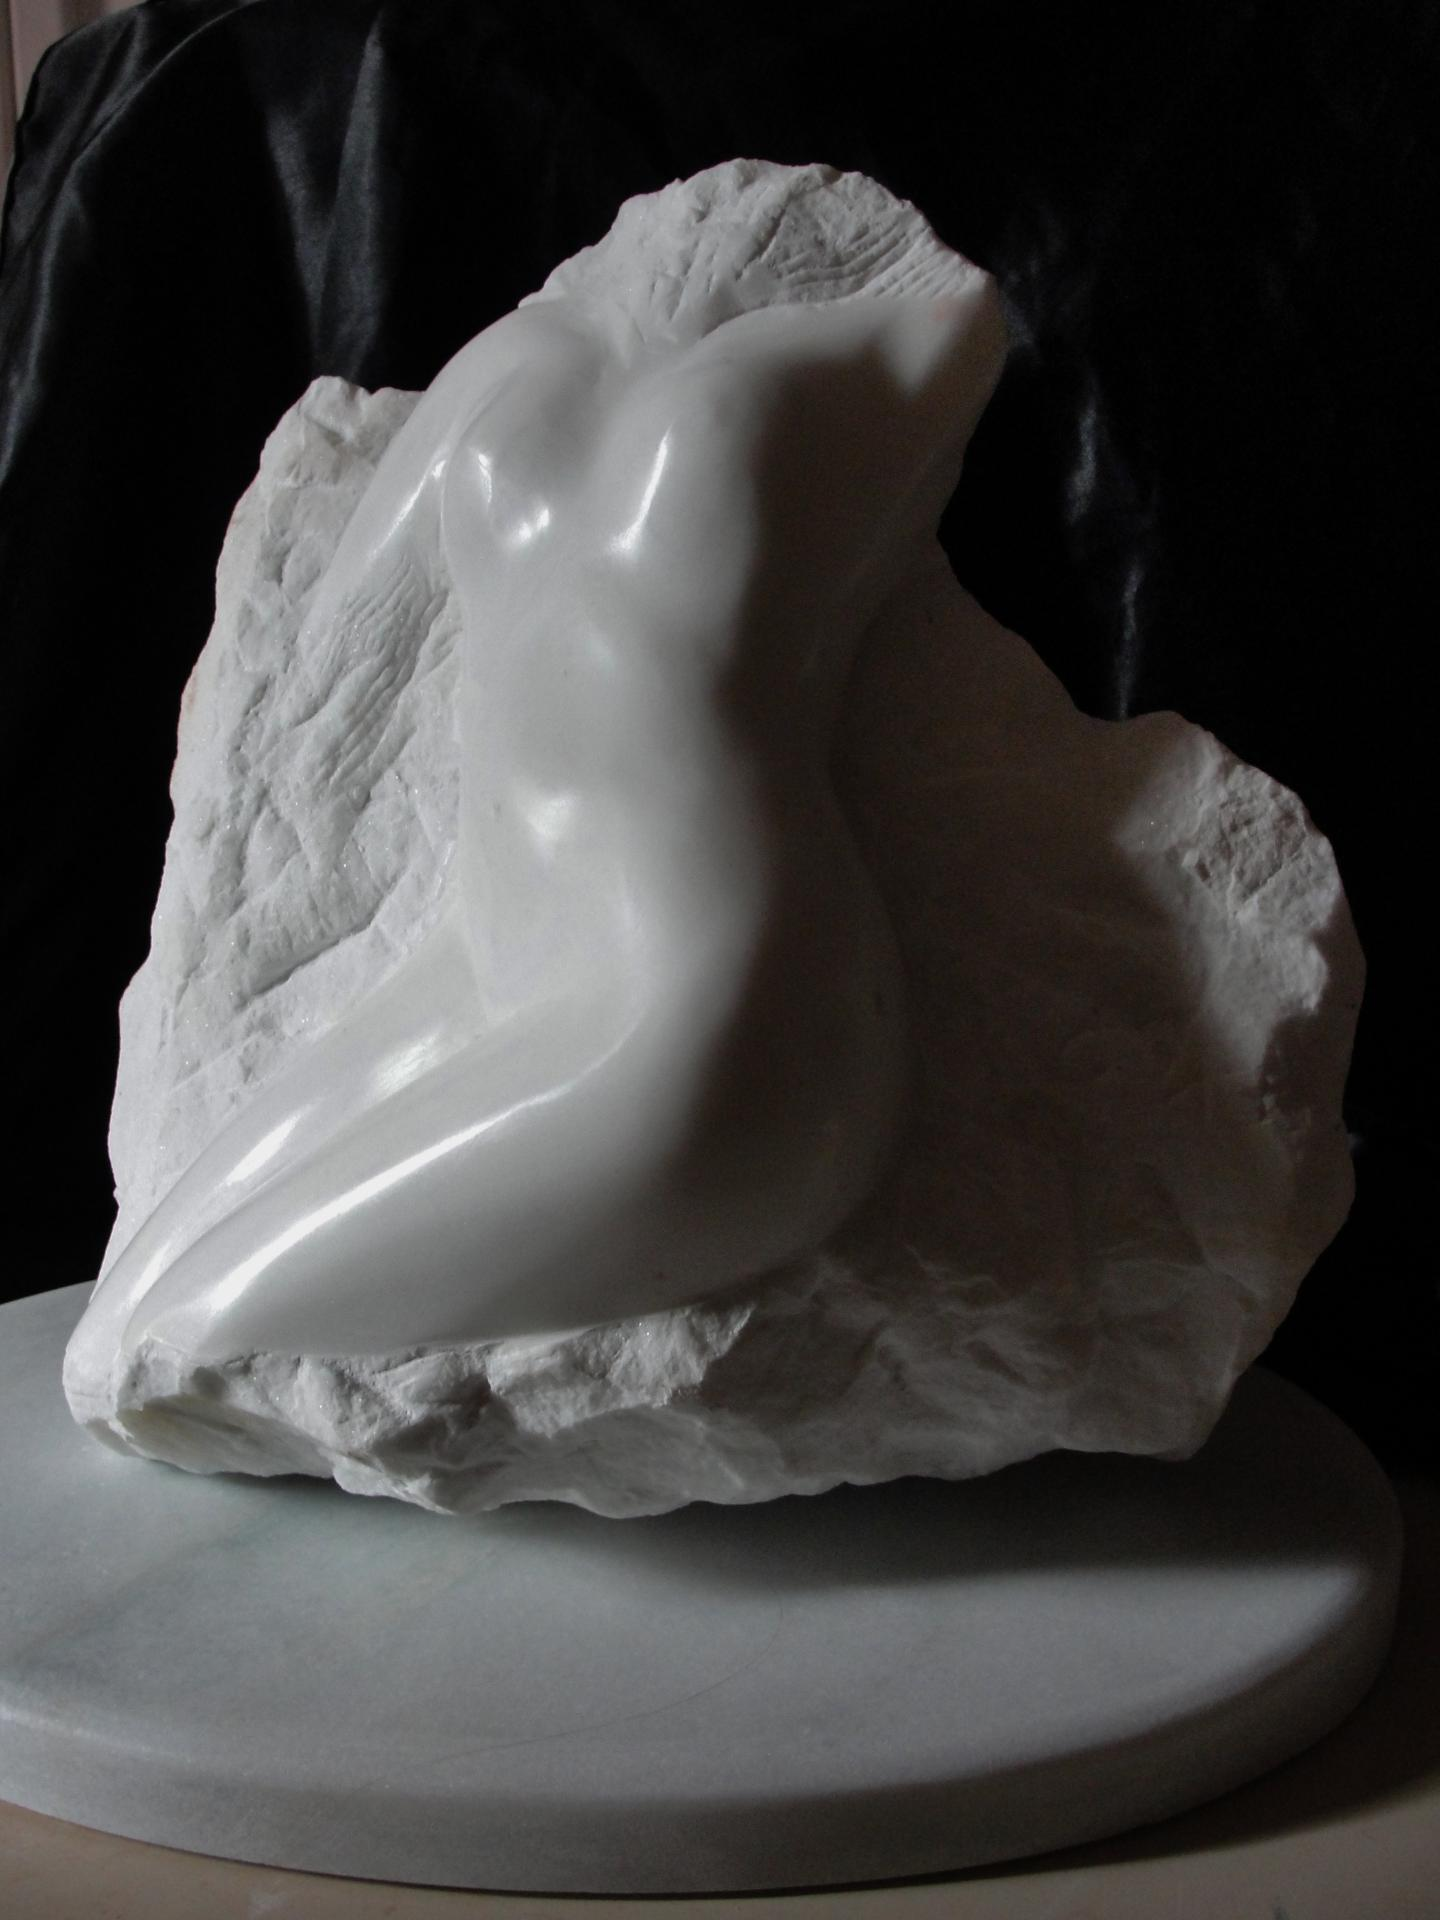 Eveil sculpture d un nu feminin en marbre 40cm relief de jean joseph chevalier 2